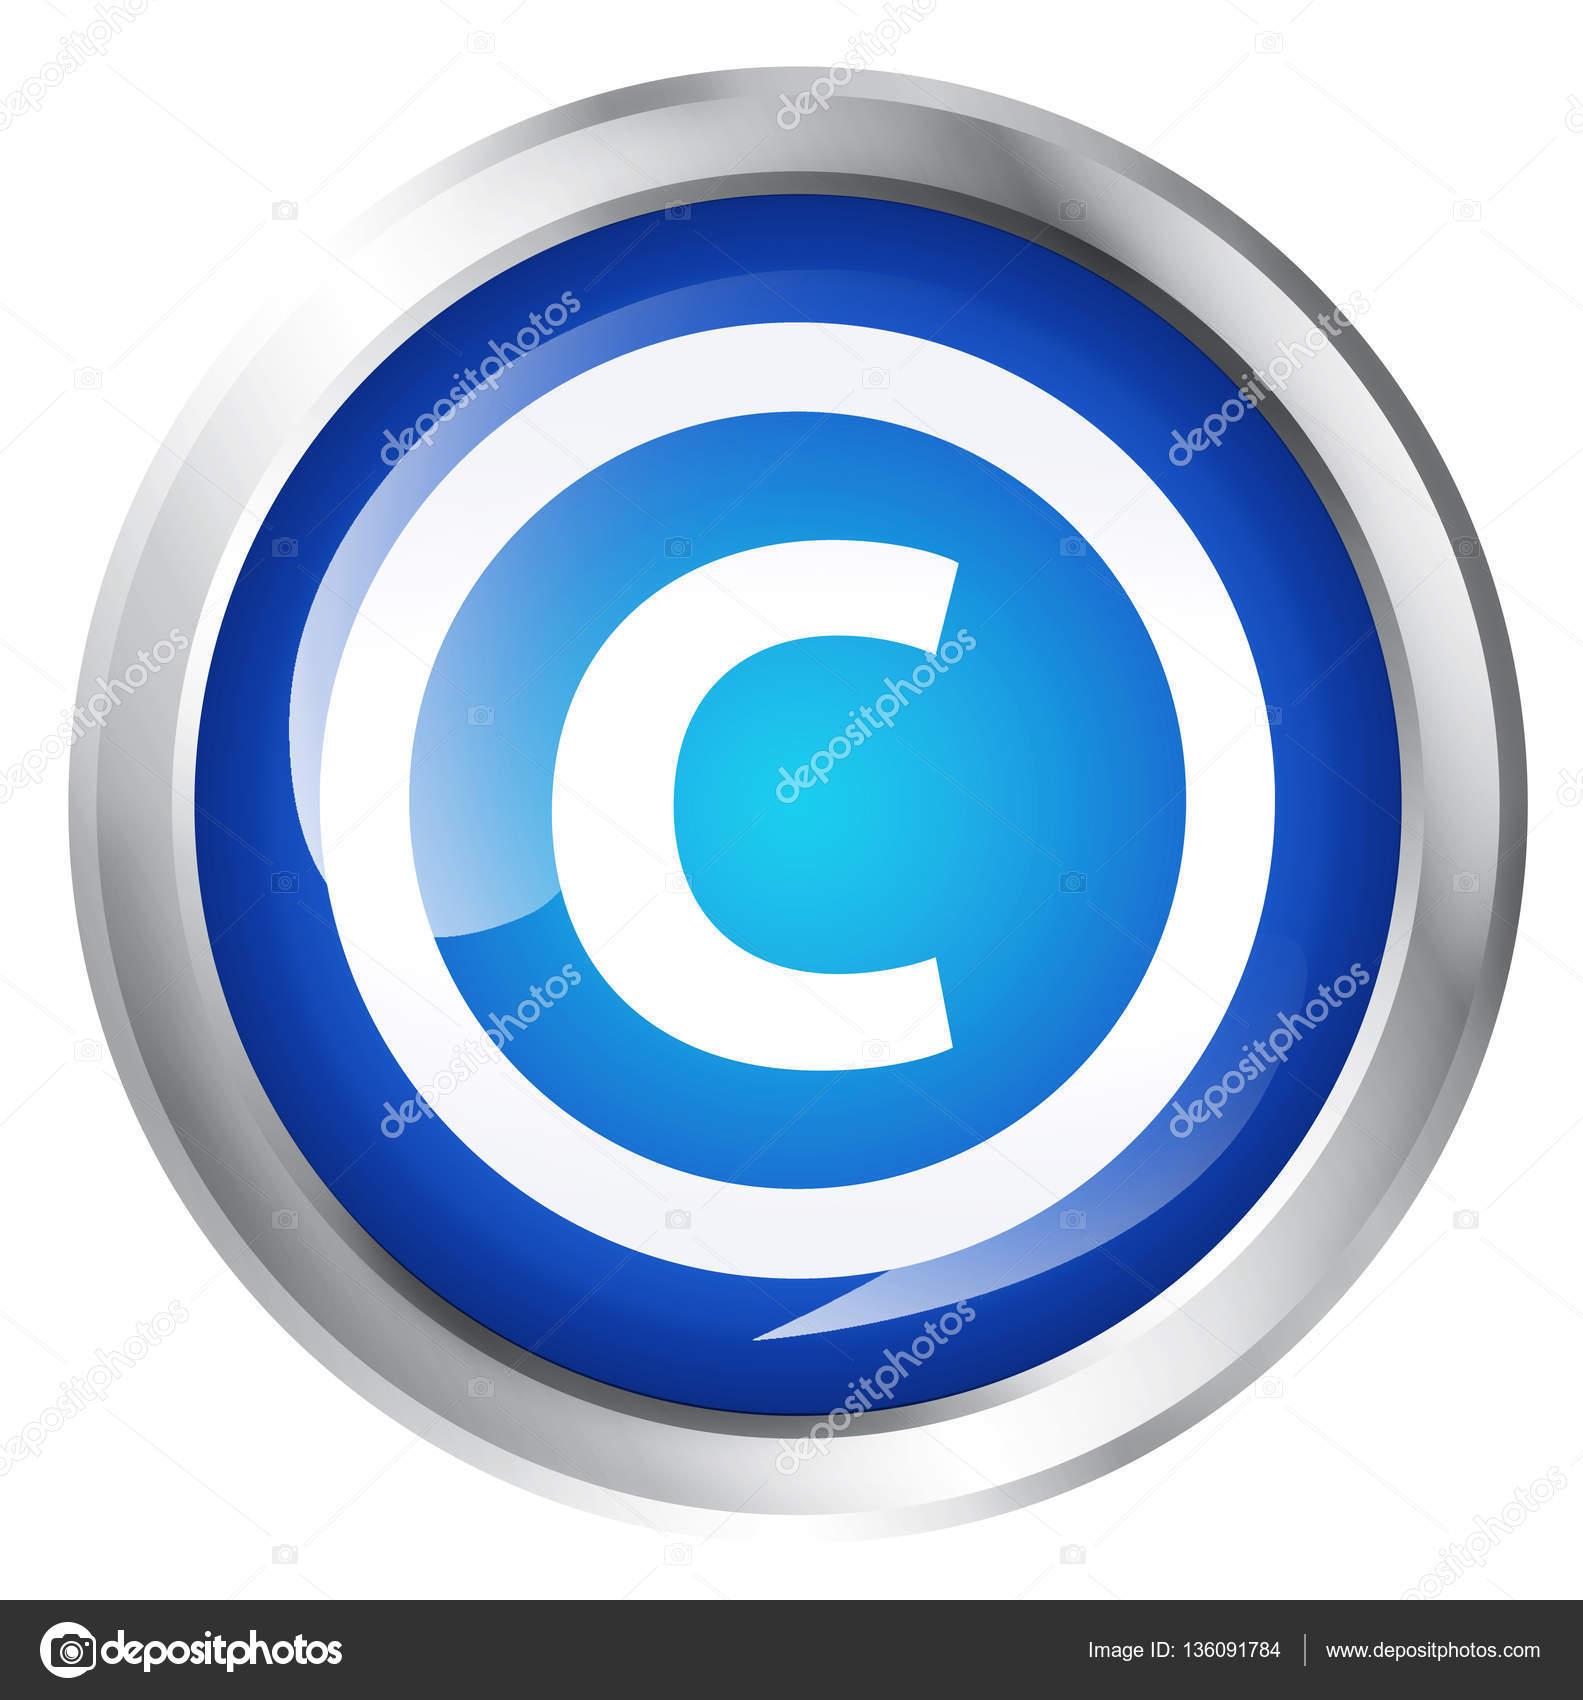 Icon with copyright symbol stock photo eivaisla 136091784 icon with copyright symbol stock photo biocorpaavc